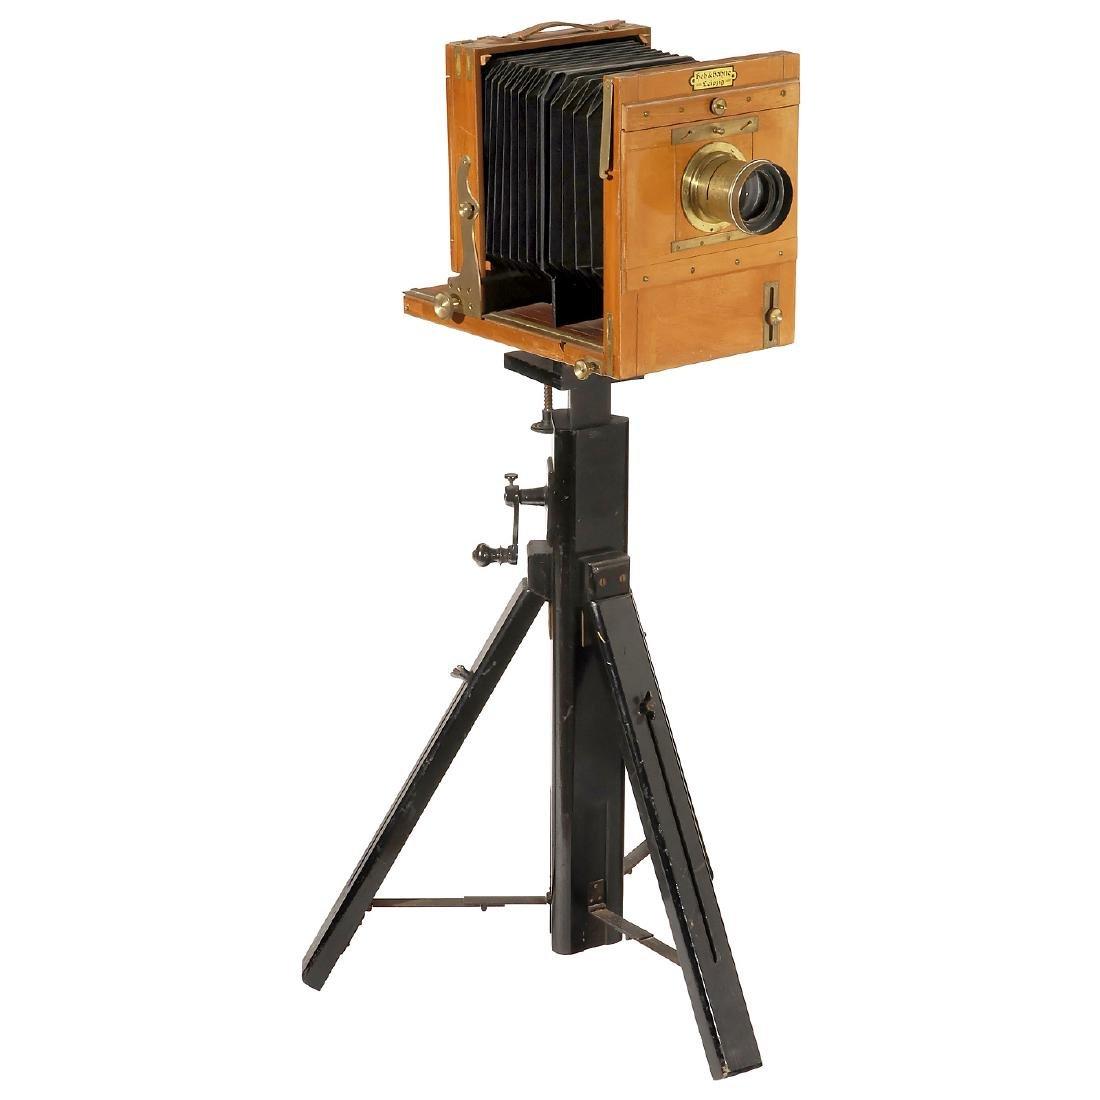 Union Field Camera, Mod. IV, 1926